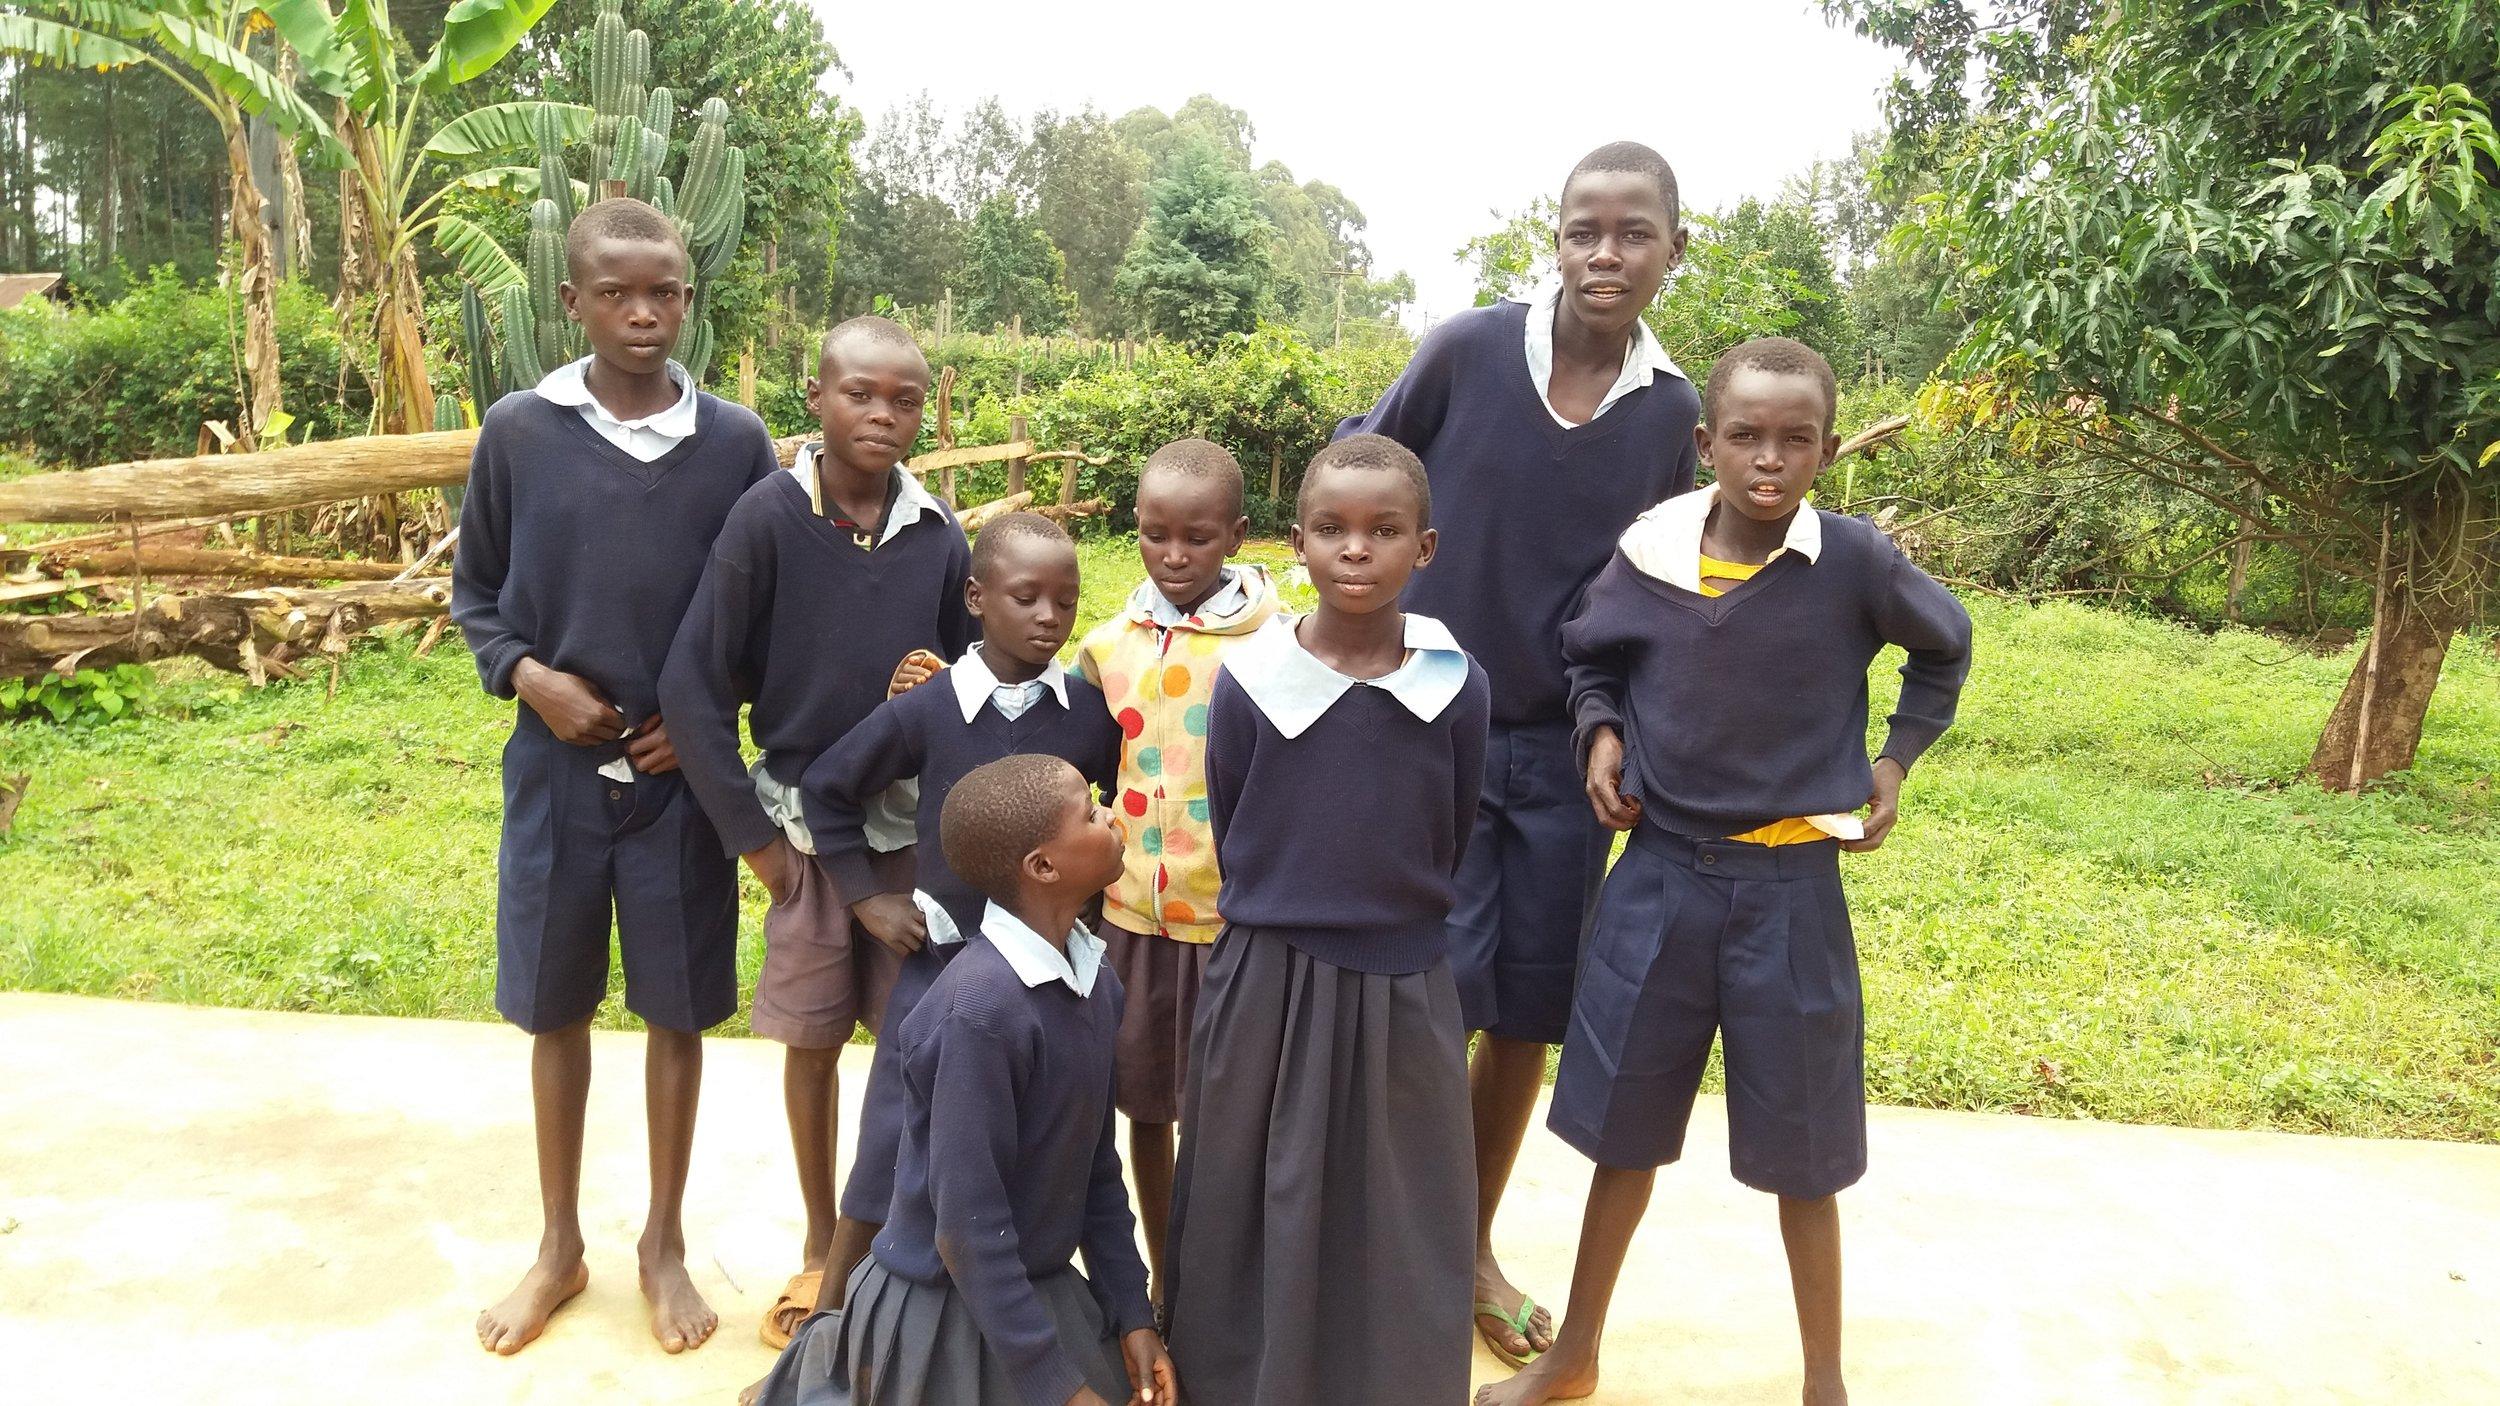 07 30 17 school uniforms.jpg